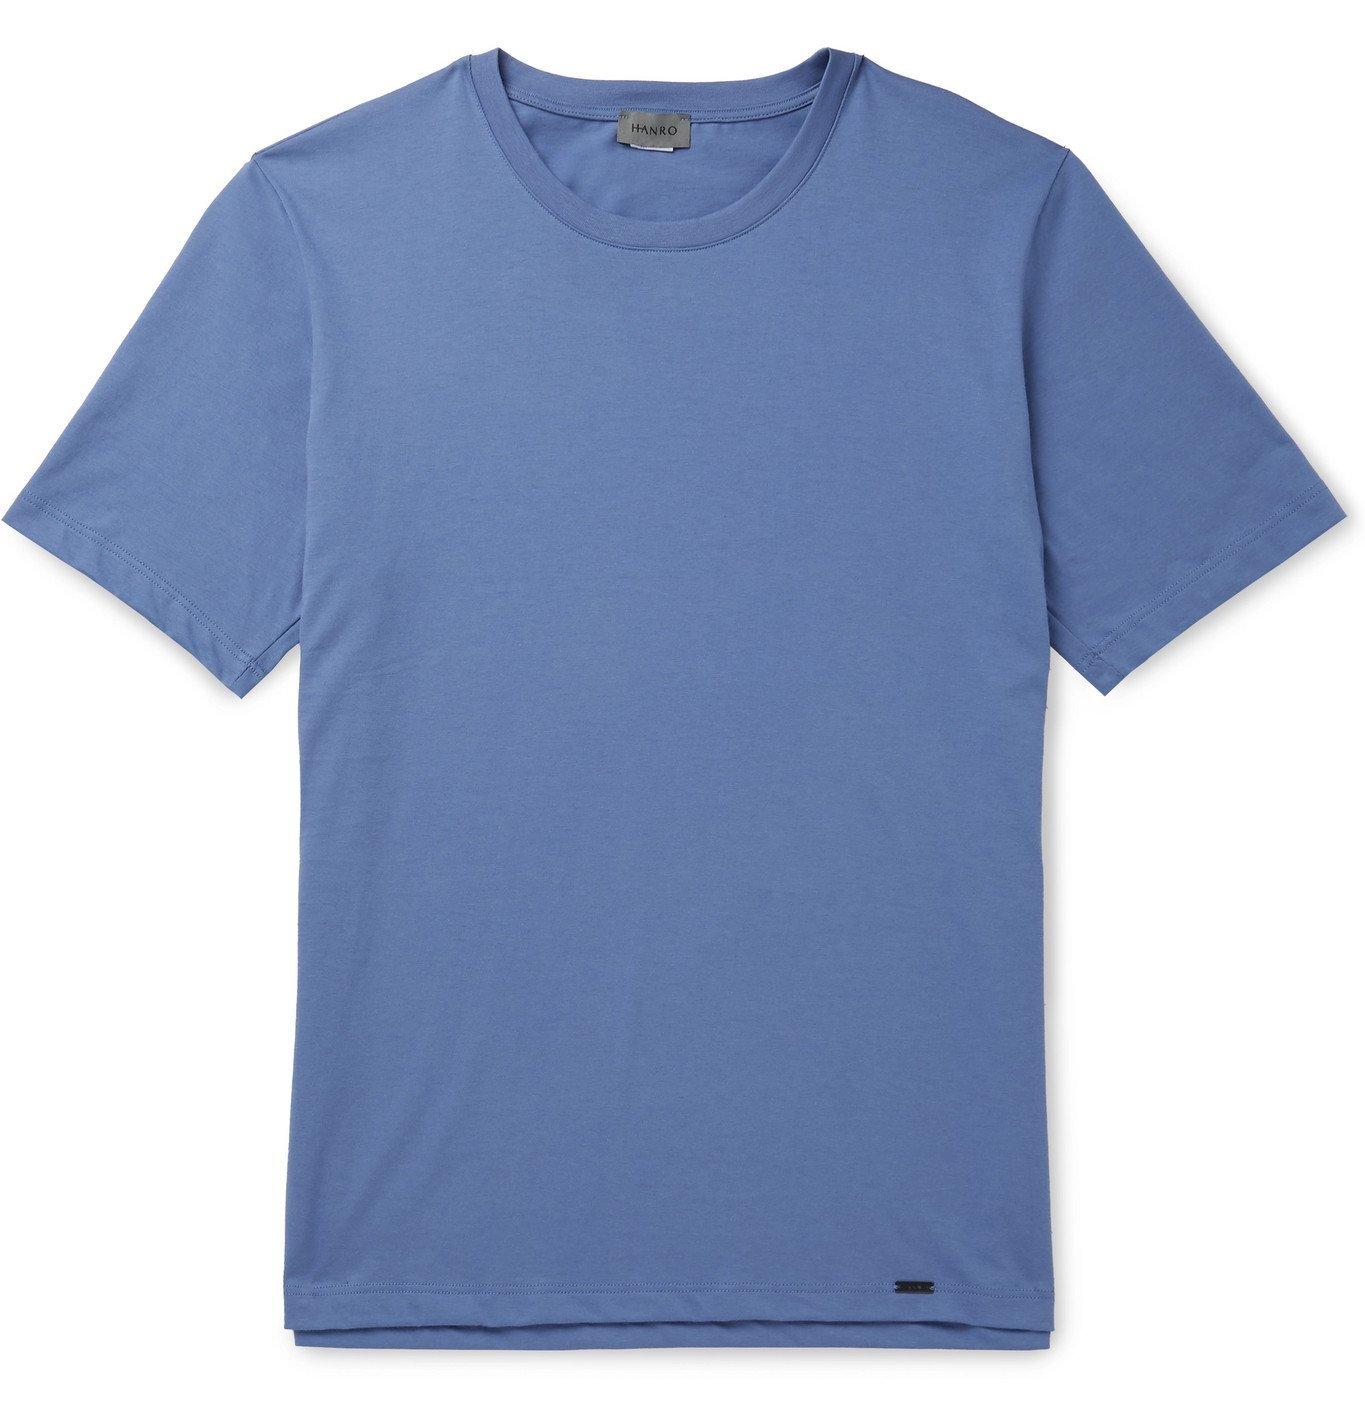 Hanro - Night & Day Cotton-Jersey Pyjama Top - Blue